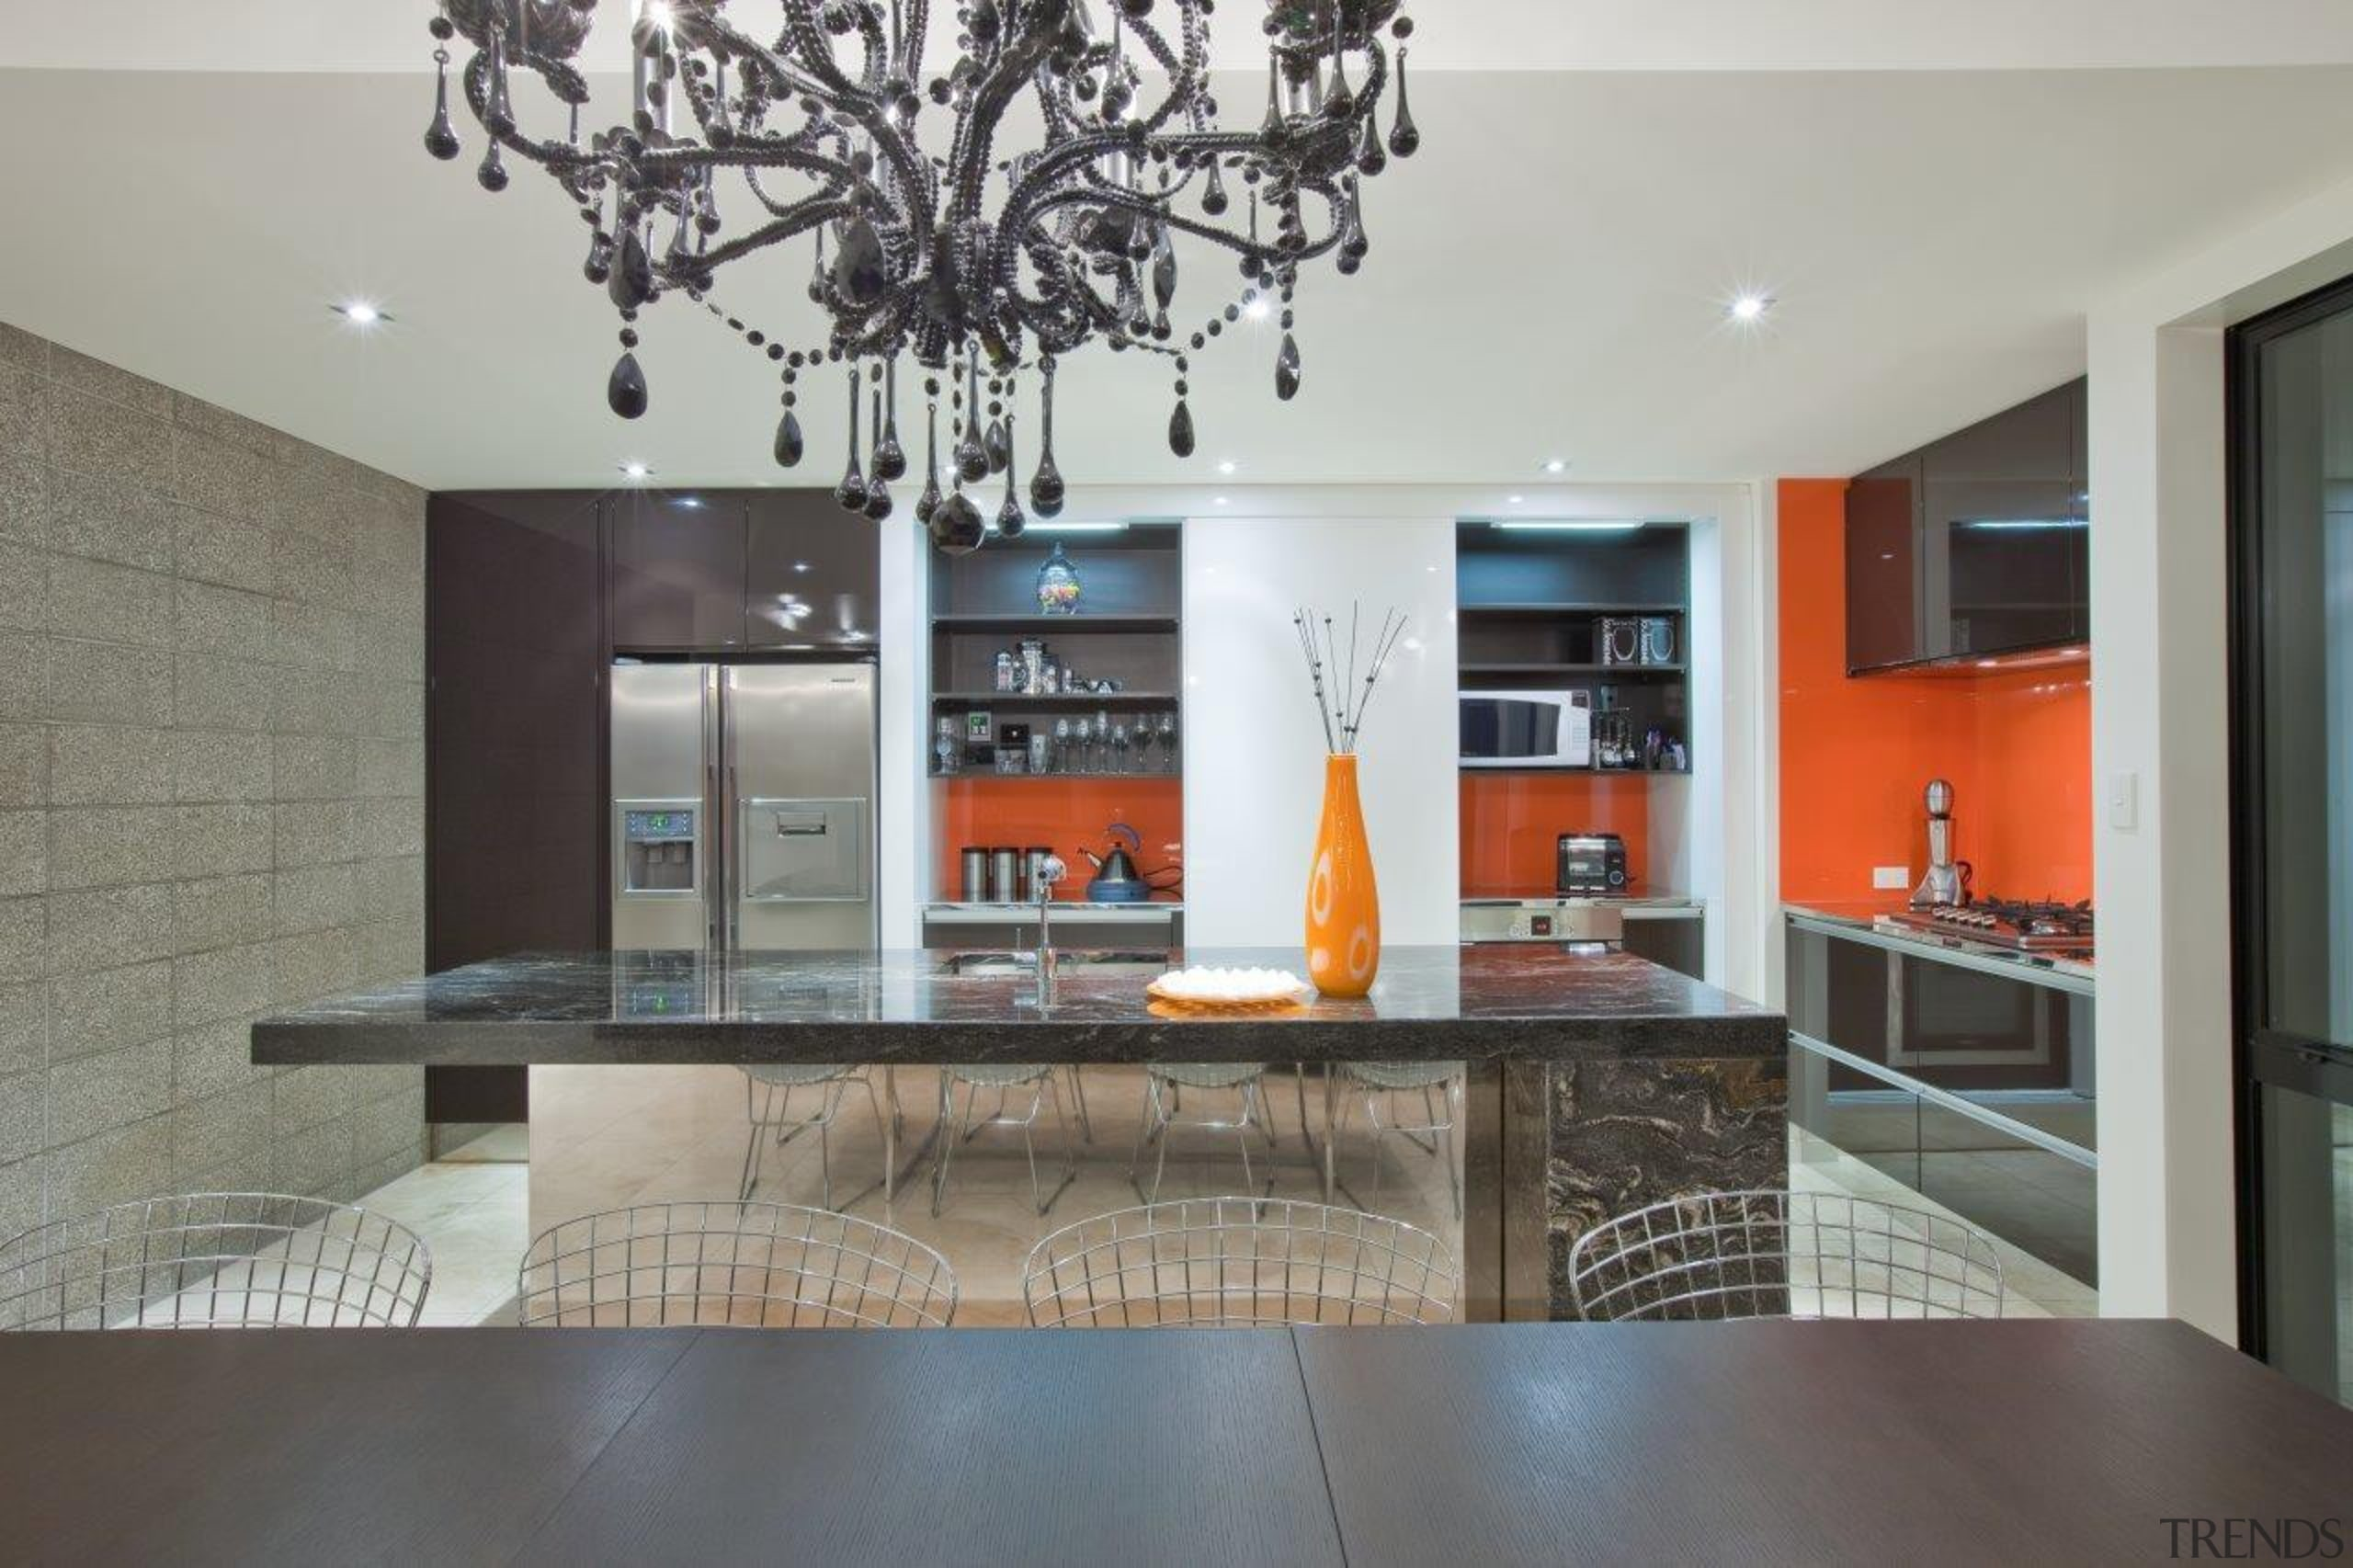 wellington kitchen.jpg - wellington_kitchen.jpg - countertop | interior countertop, interior design, kitchen, living room, property, real estate, gray